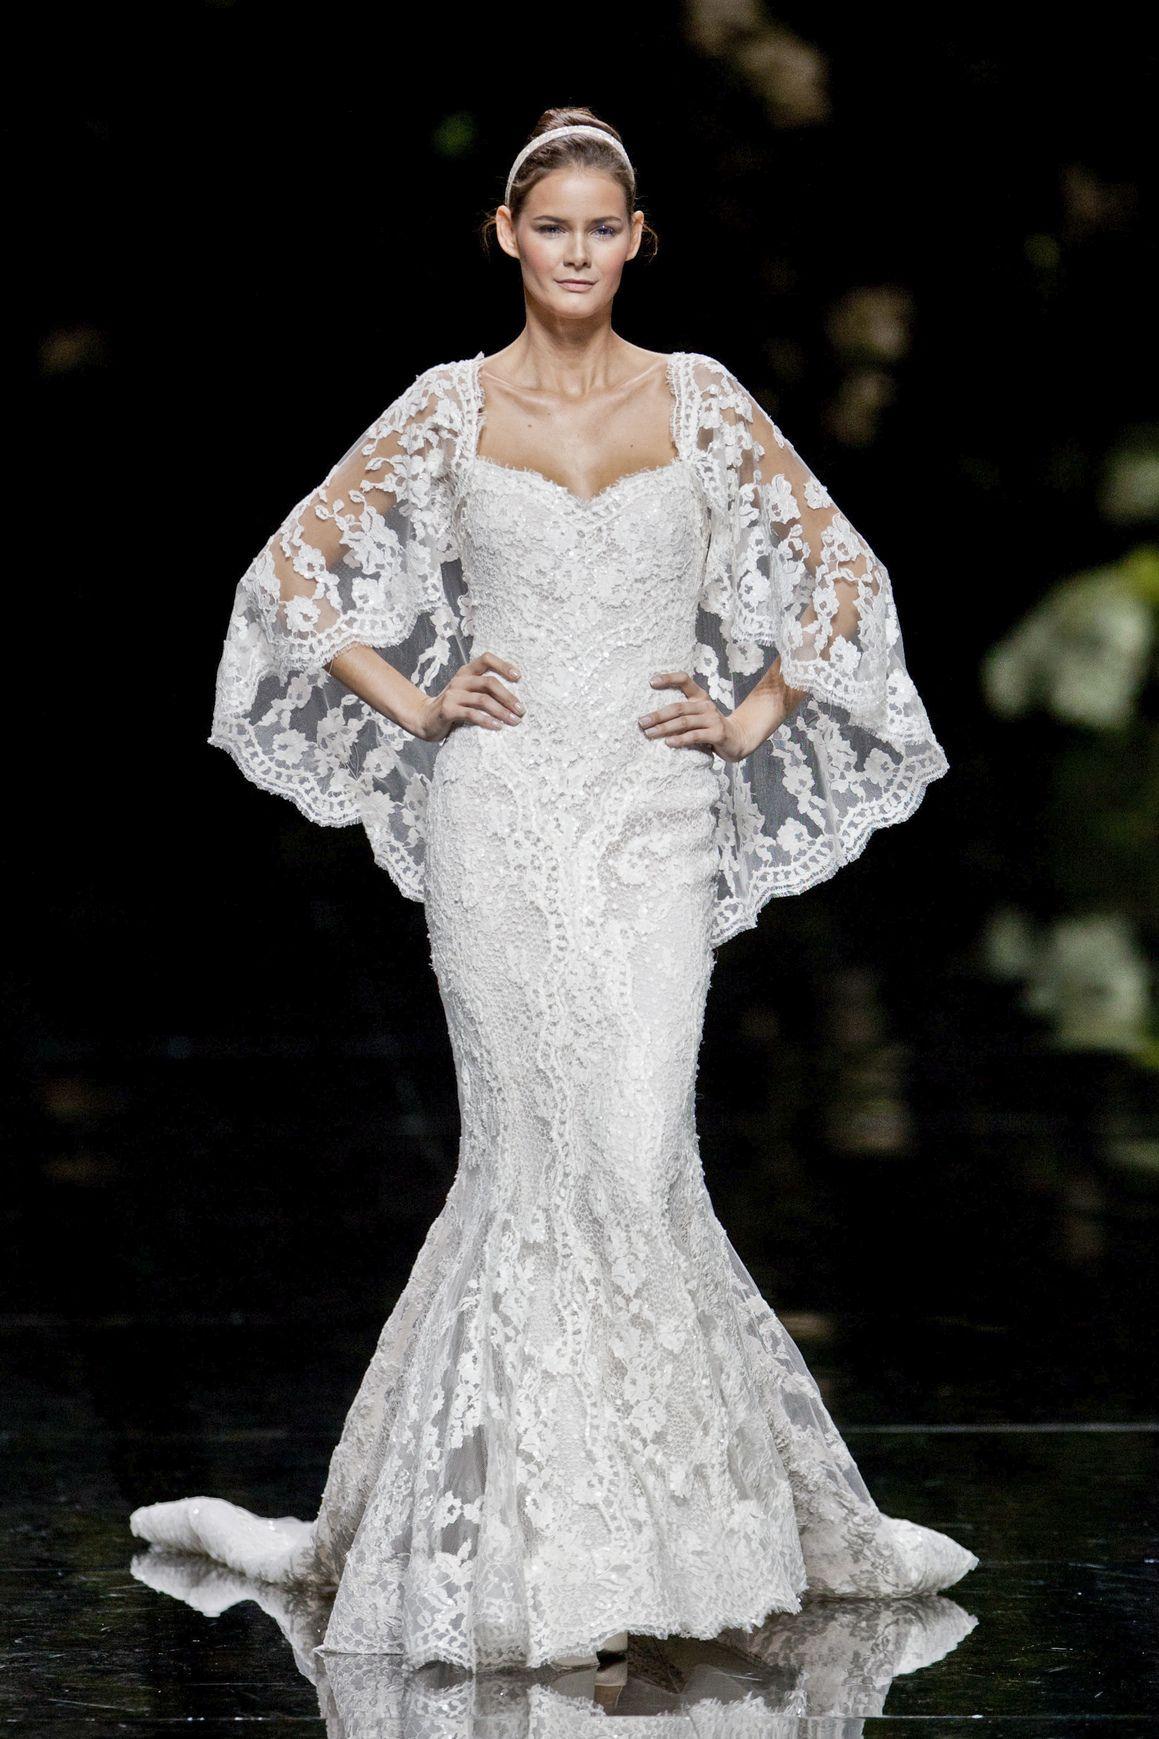 Juana Martin S/S 2013 WEDDING Dresses, Most beautiful